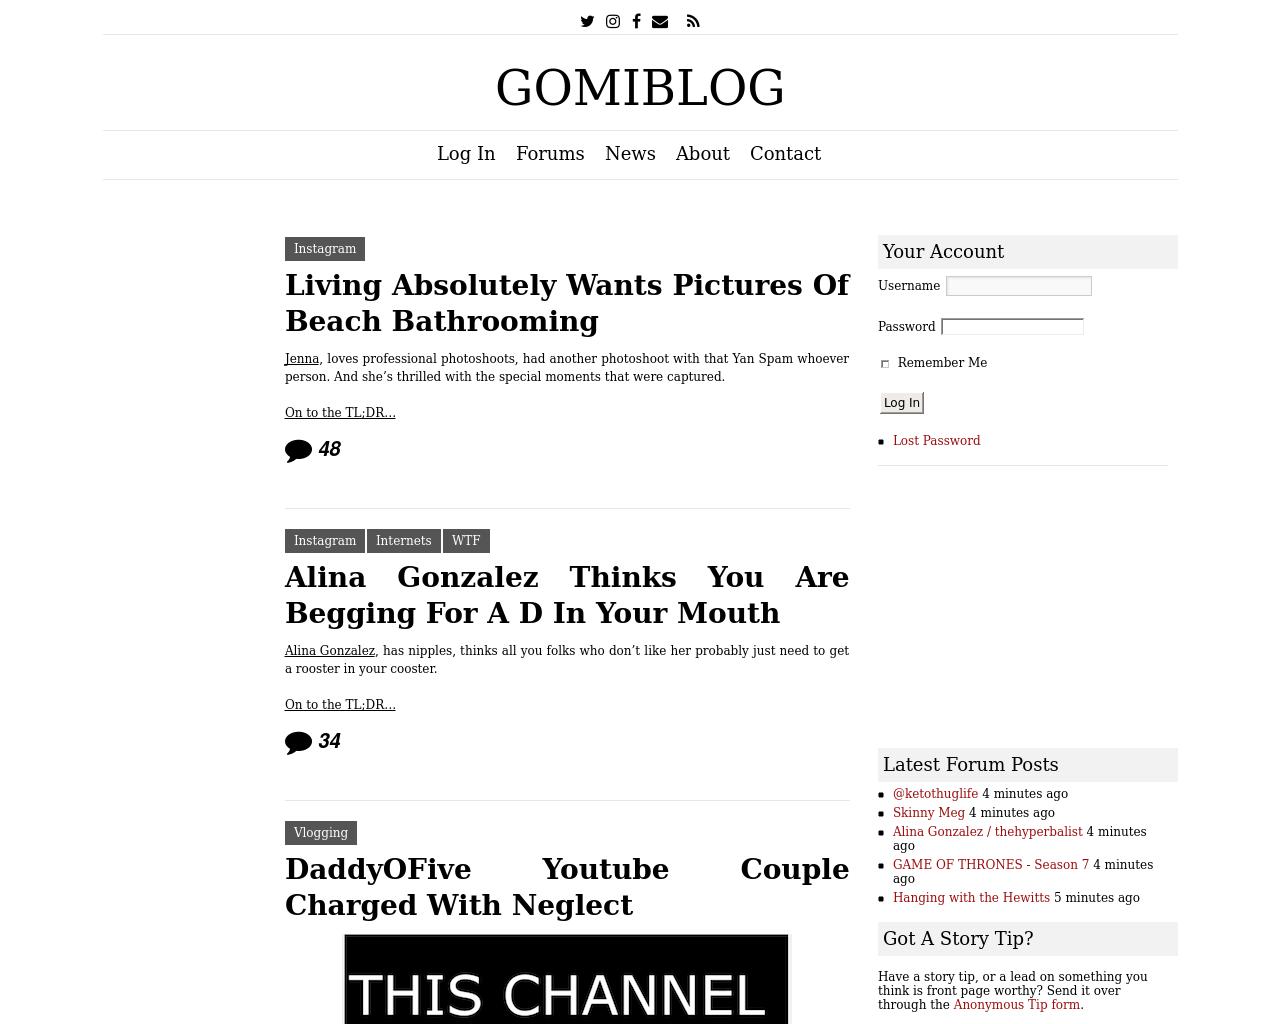 GOMI-Advertising-Reviews-Pricing